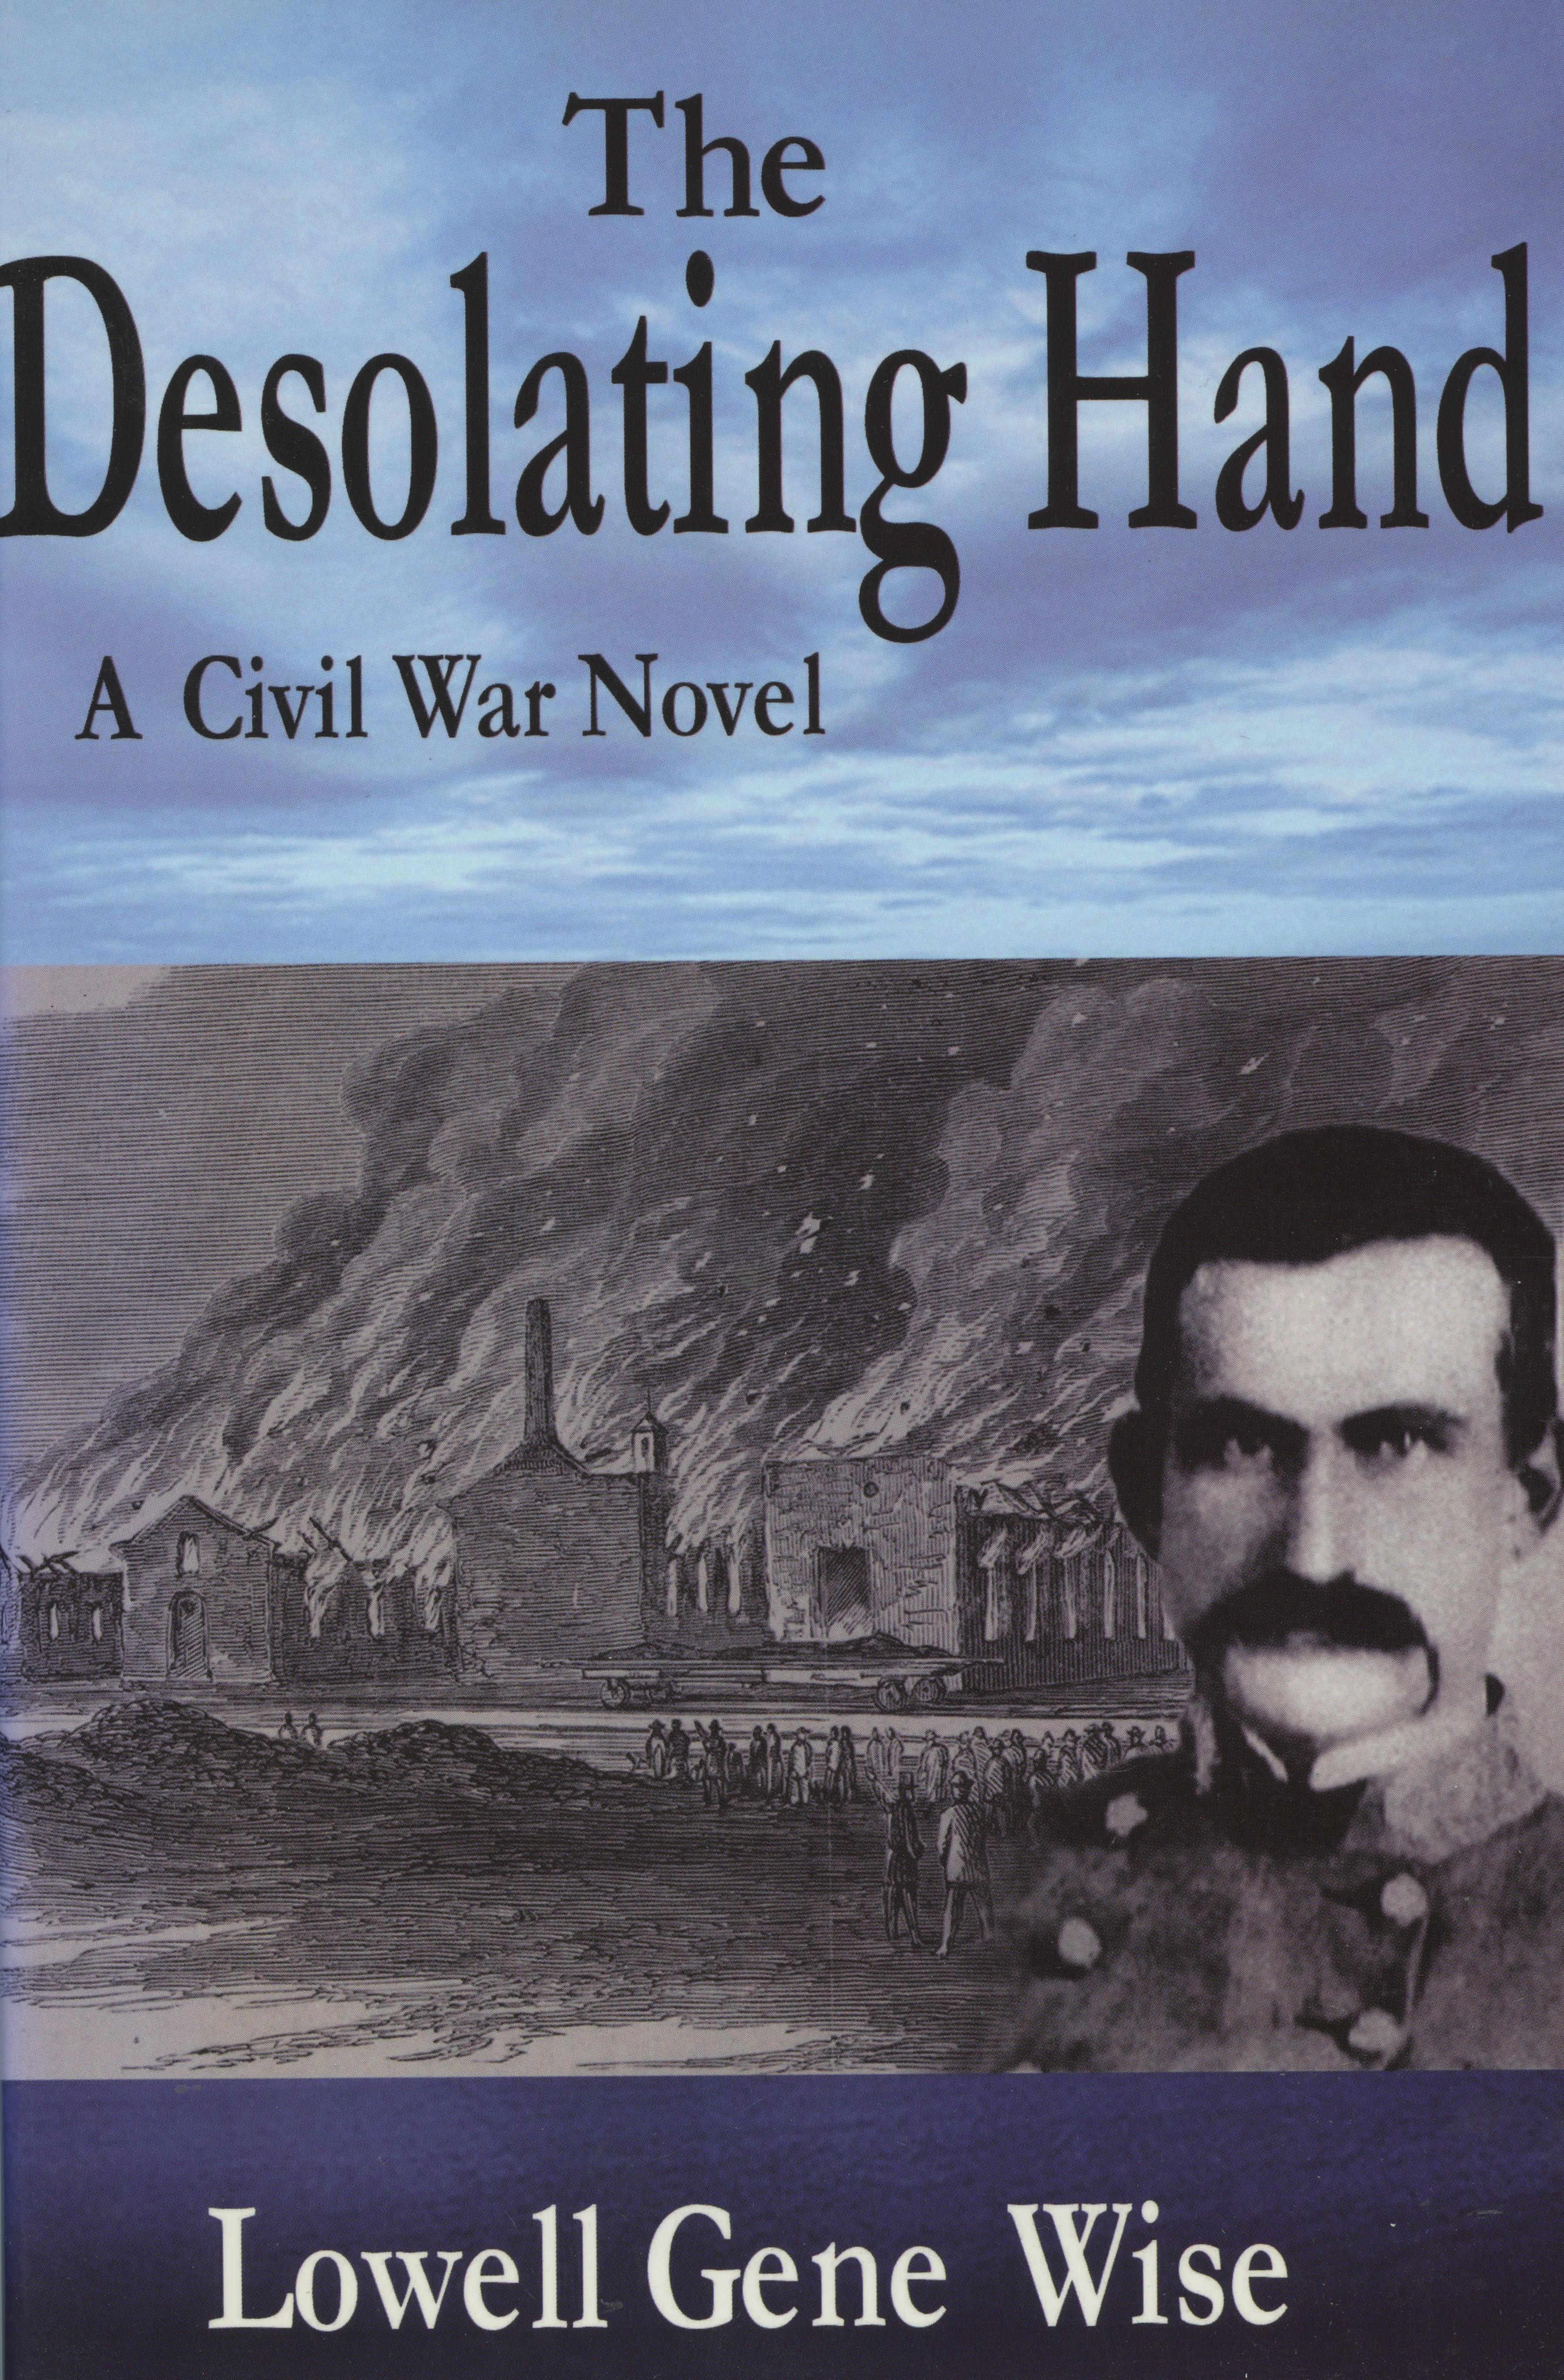 The Desolating Hand